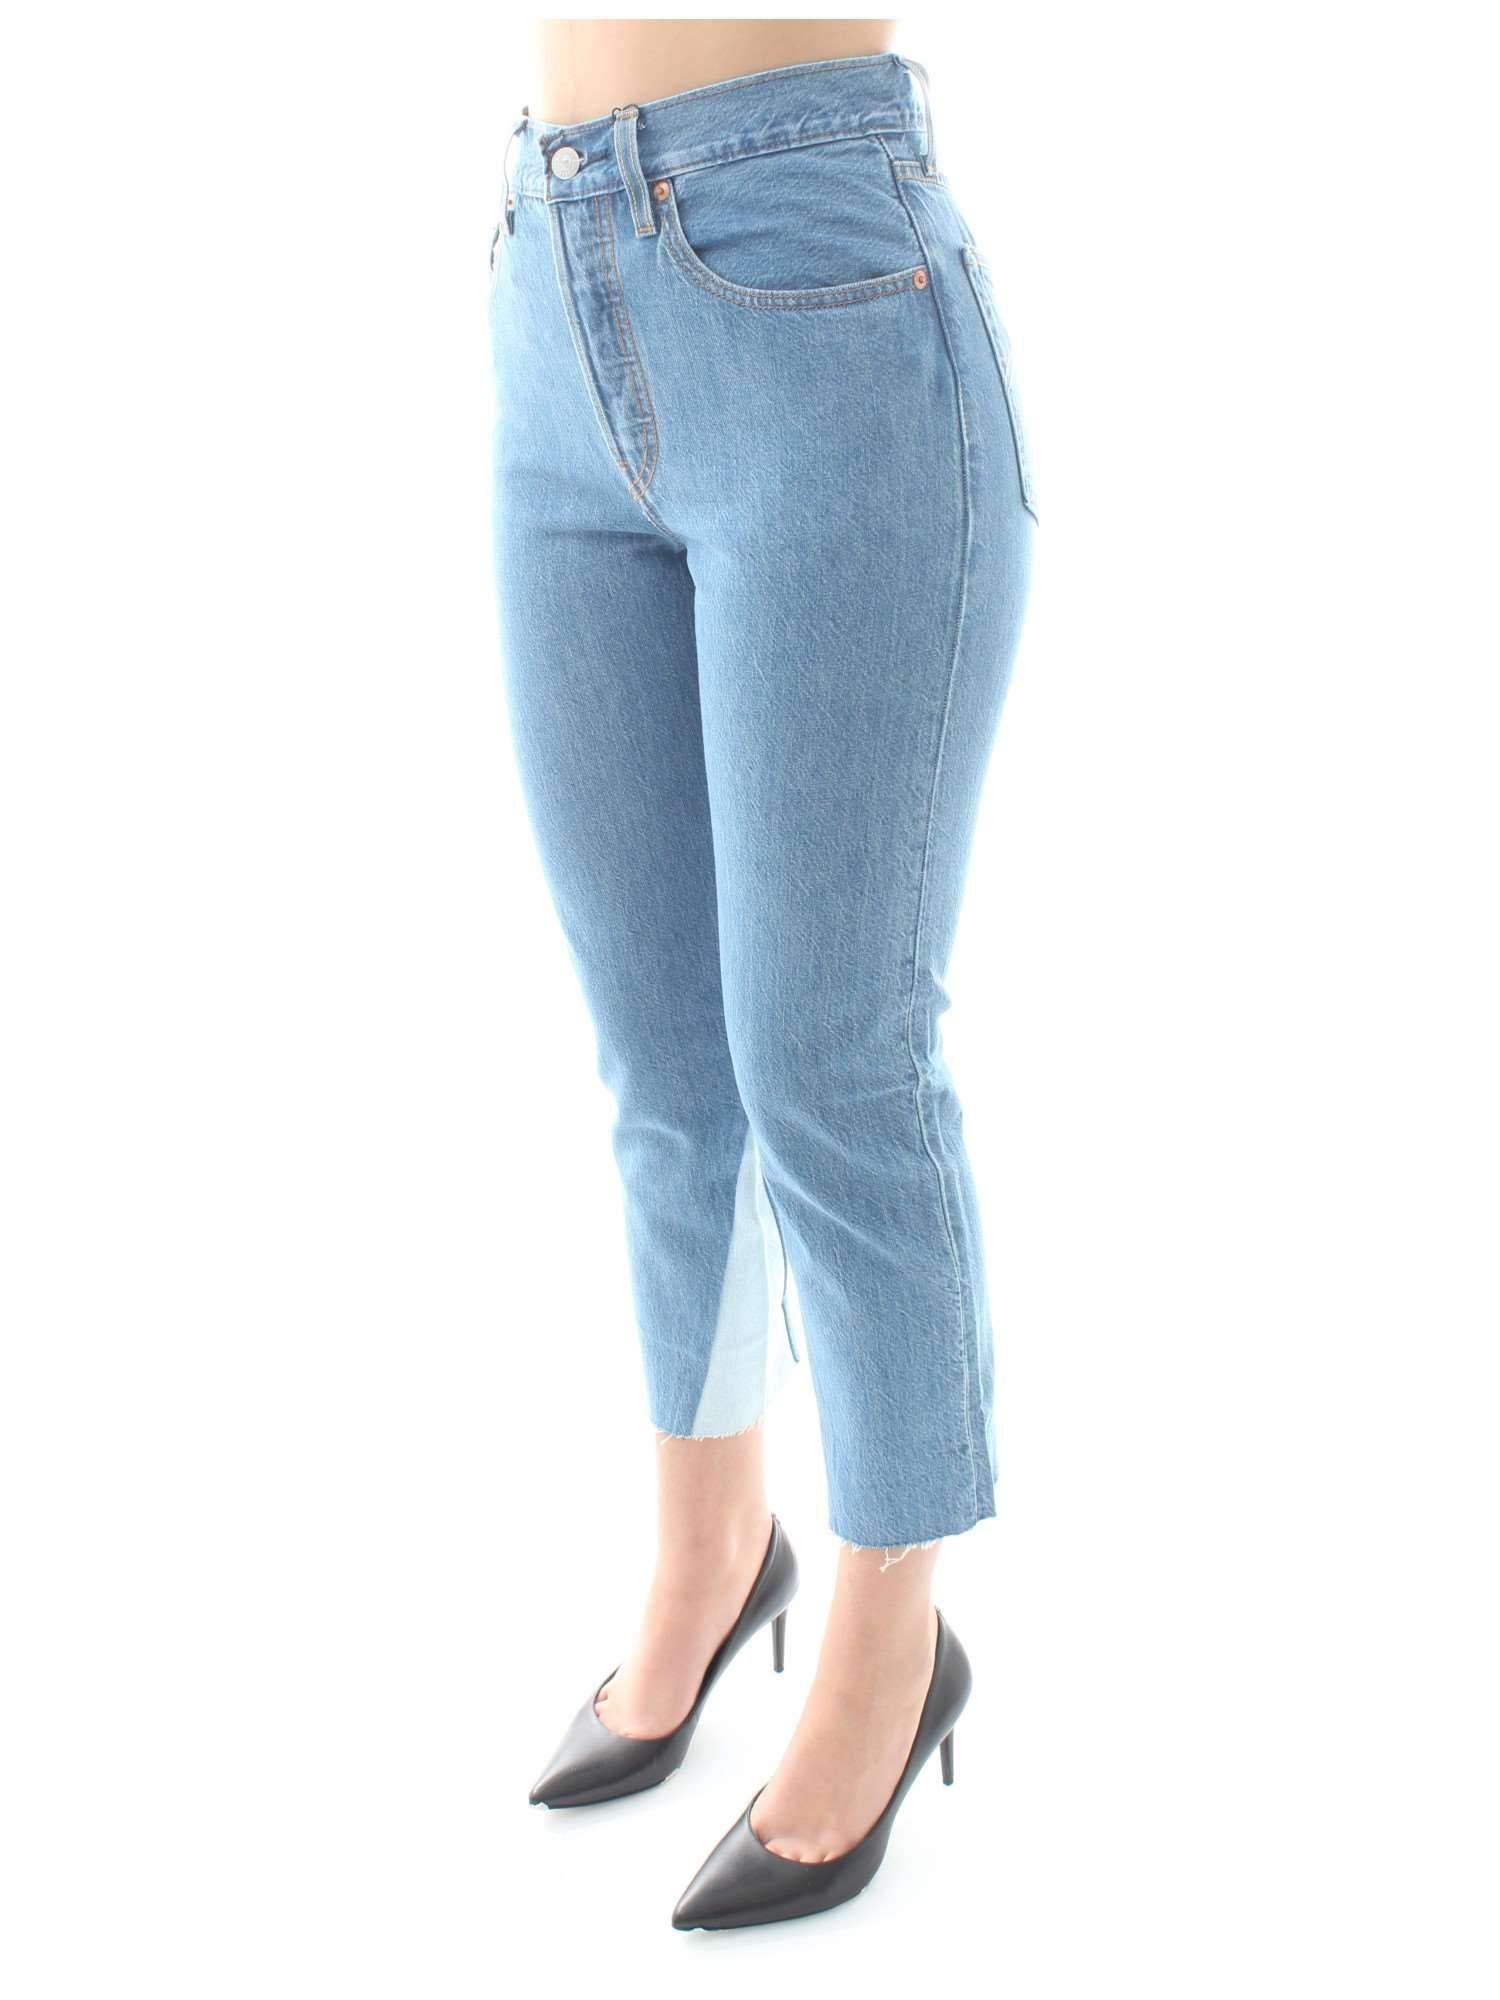 Levi Strauss & Co. 36200-0049 Pantalones Vaqueros Mujer BLU Denim 30